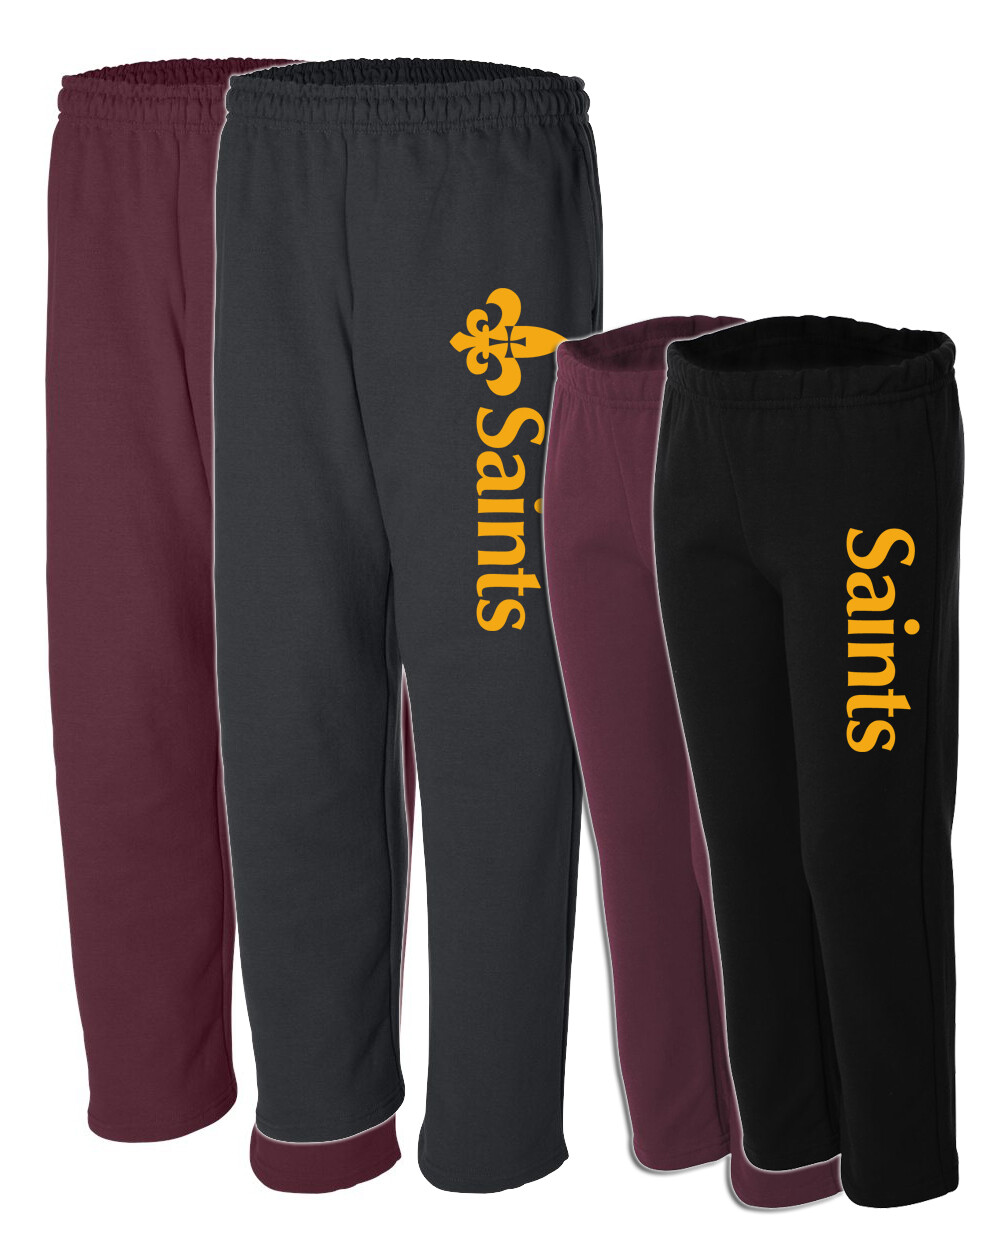 St. James Saints Open-Bottom Sweatpants - Adult / Youth